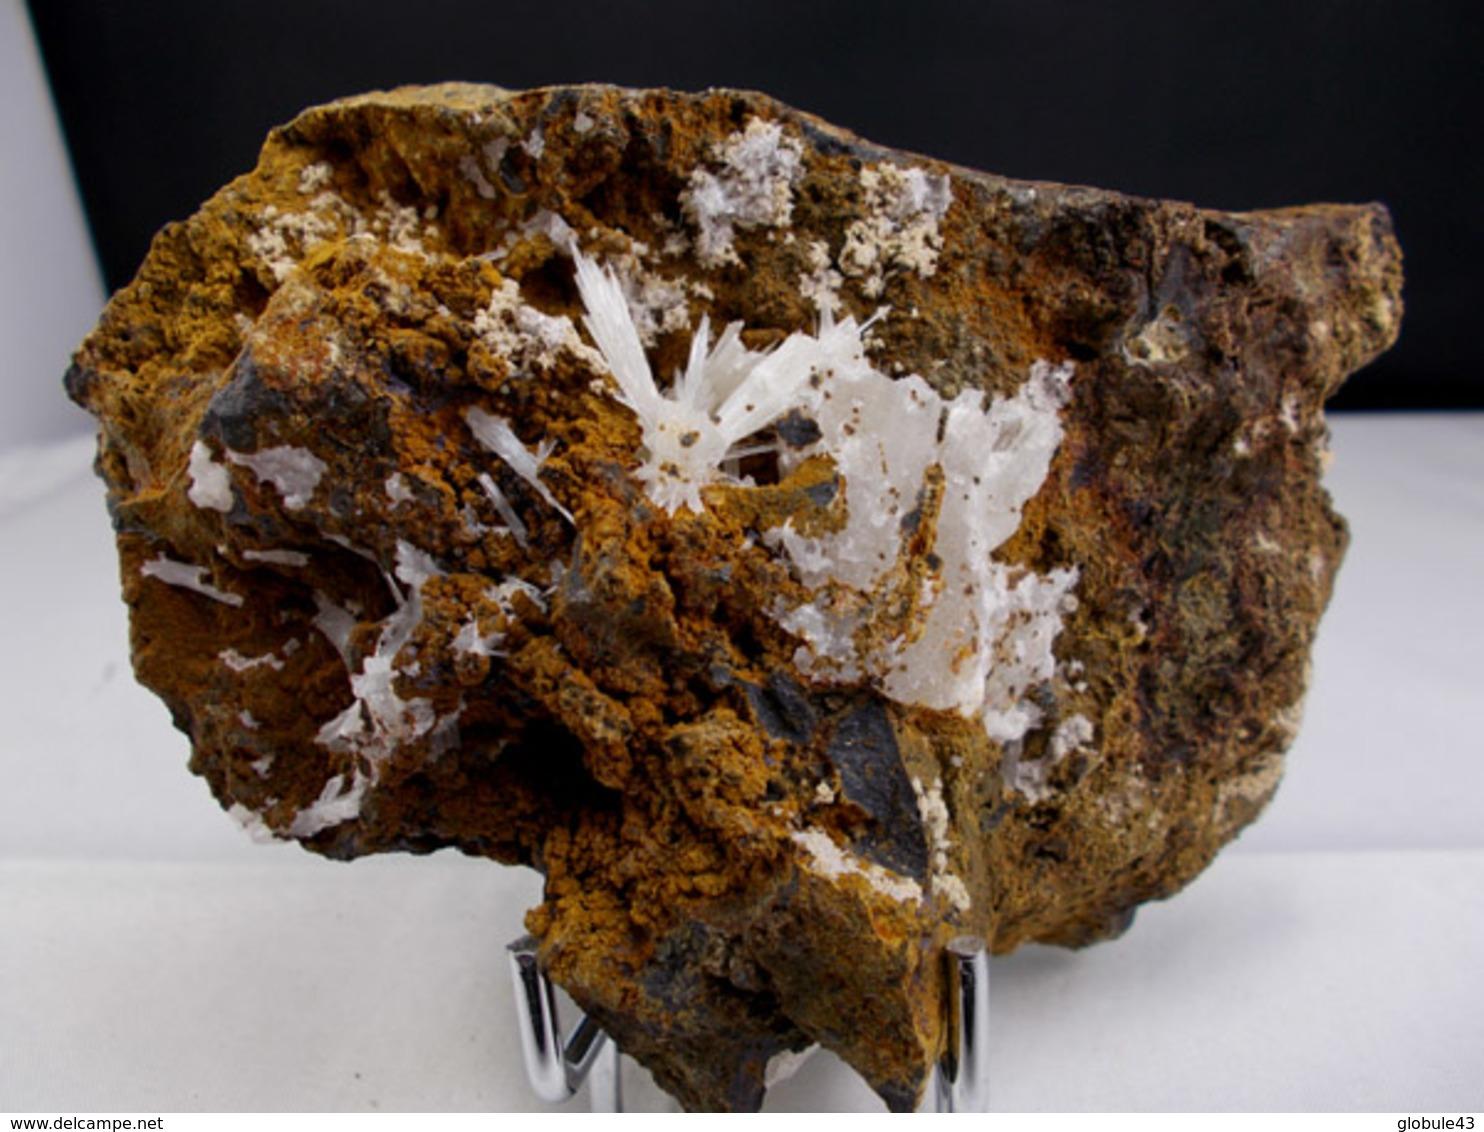 ARAGONITE EN GERBES SUR BASALTE 11, X 6,5 Cm CUREBOURSE - Minerals